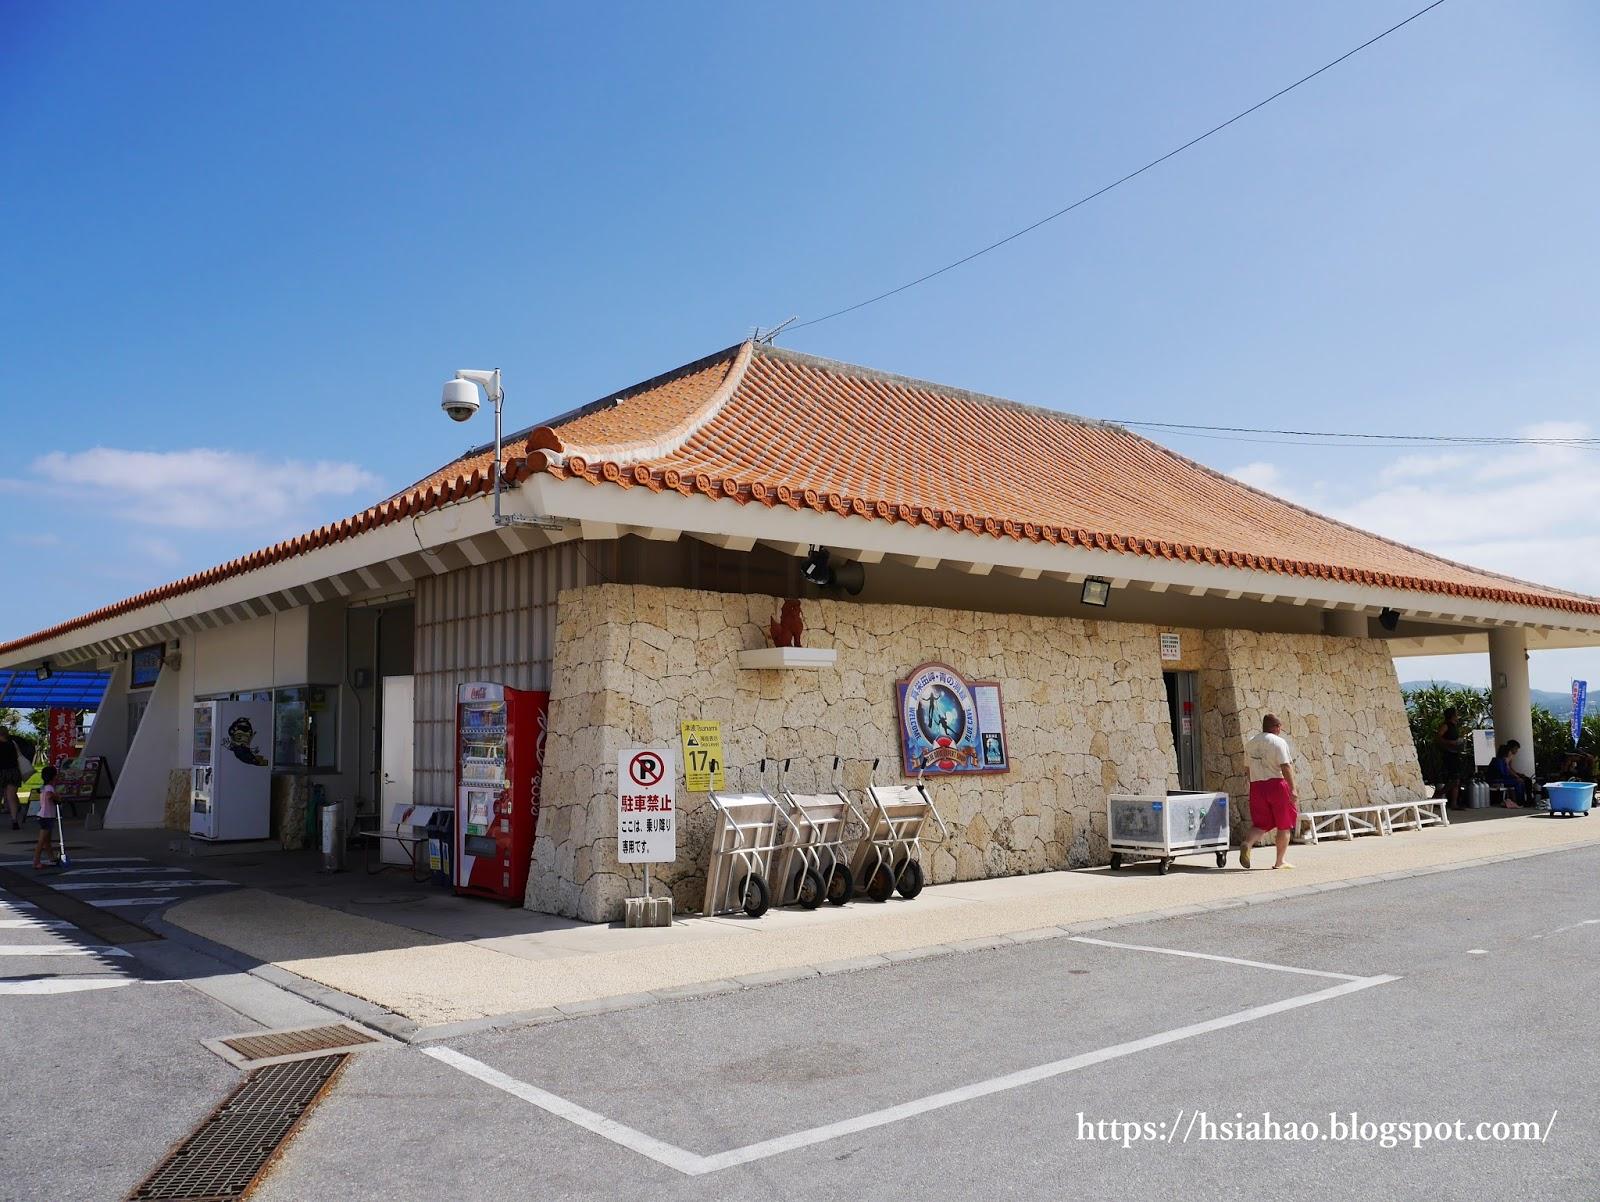 沖繩-景點-餐廳-真榮田岬-青之洞窟-潛水-浮潛-青の洞窟-自由行-旅遊-Okinawa-diving-snorkeling-maeda-cape-blue-cave